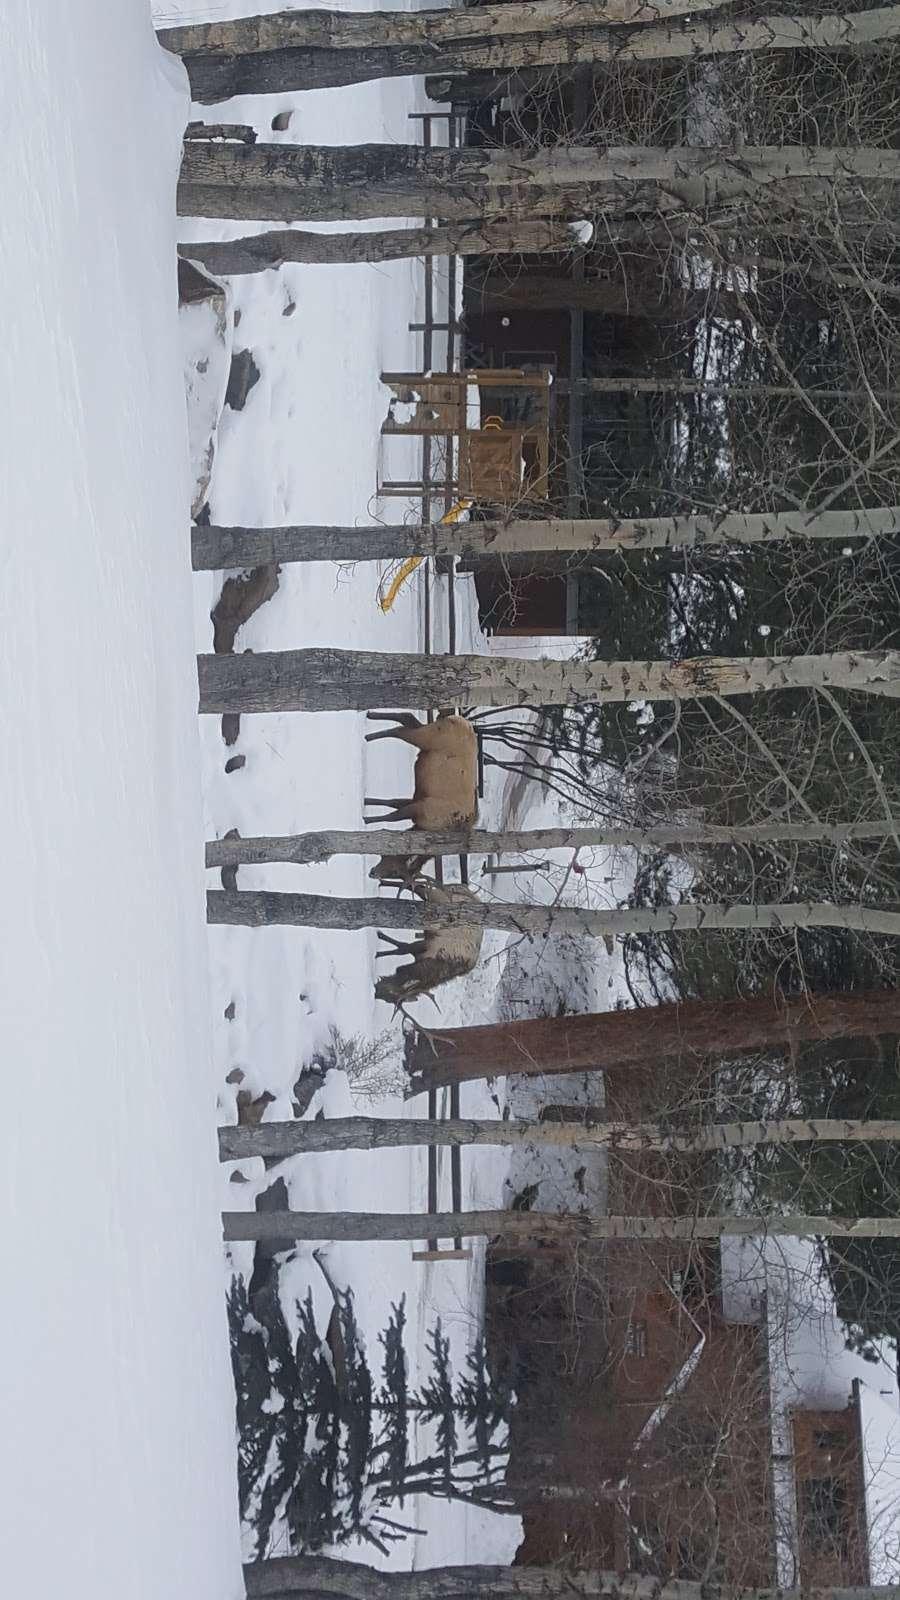 Estes Park Retreat - real estate agency  | Photo 9 of 9 | Address: 1180 Fall River Rd, Estes Park, CO 80517, USA